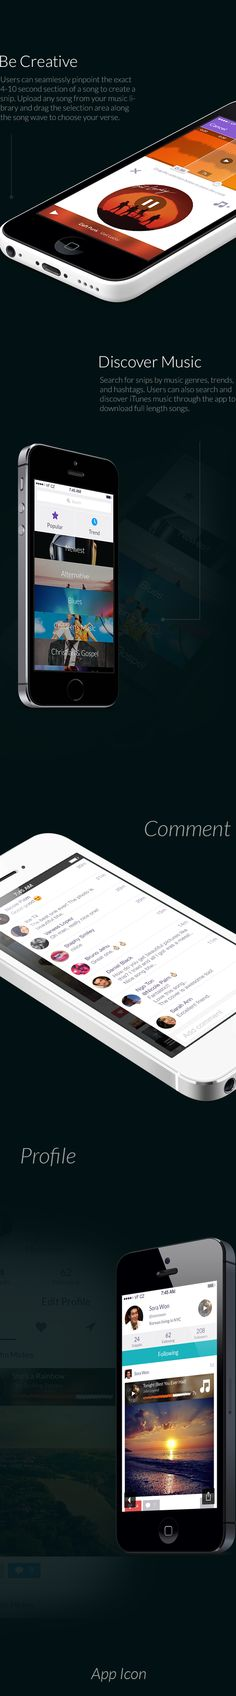 Snippit iOS App